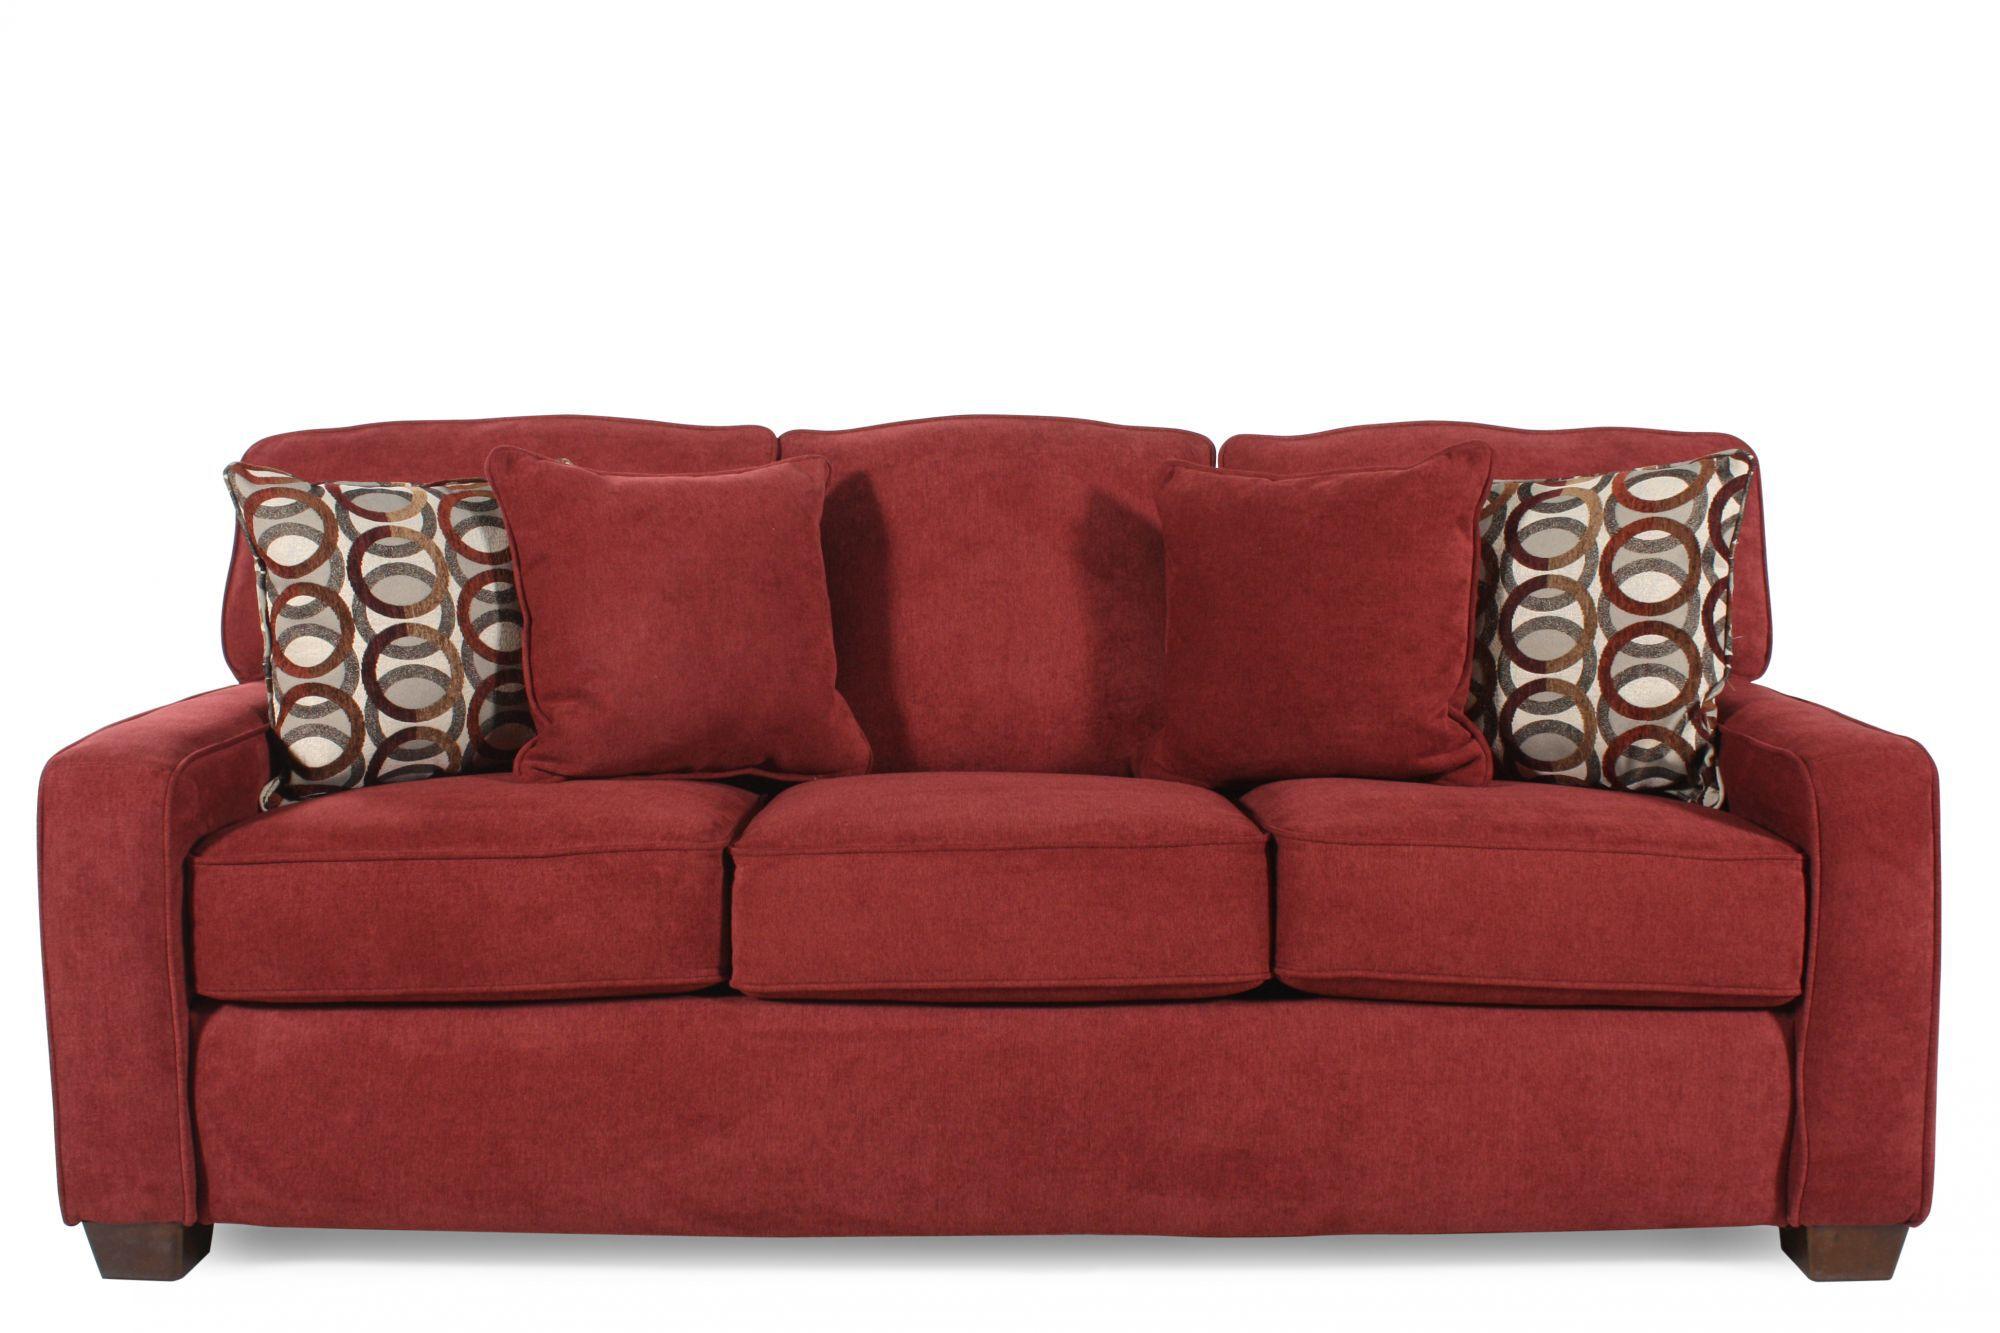 IRest Casual 82 Queen Sleeper Sofa in Red Berry  Mathis